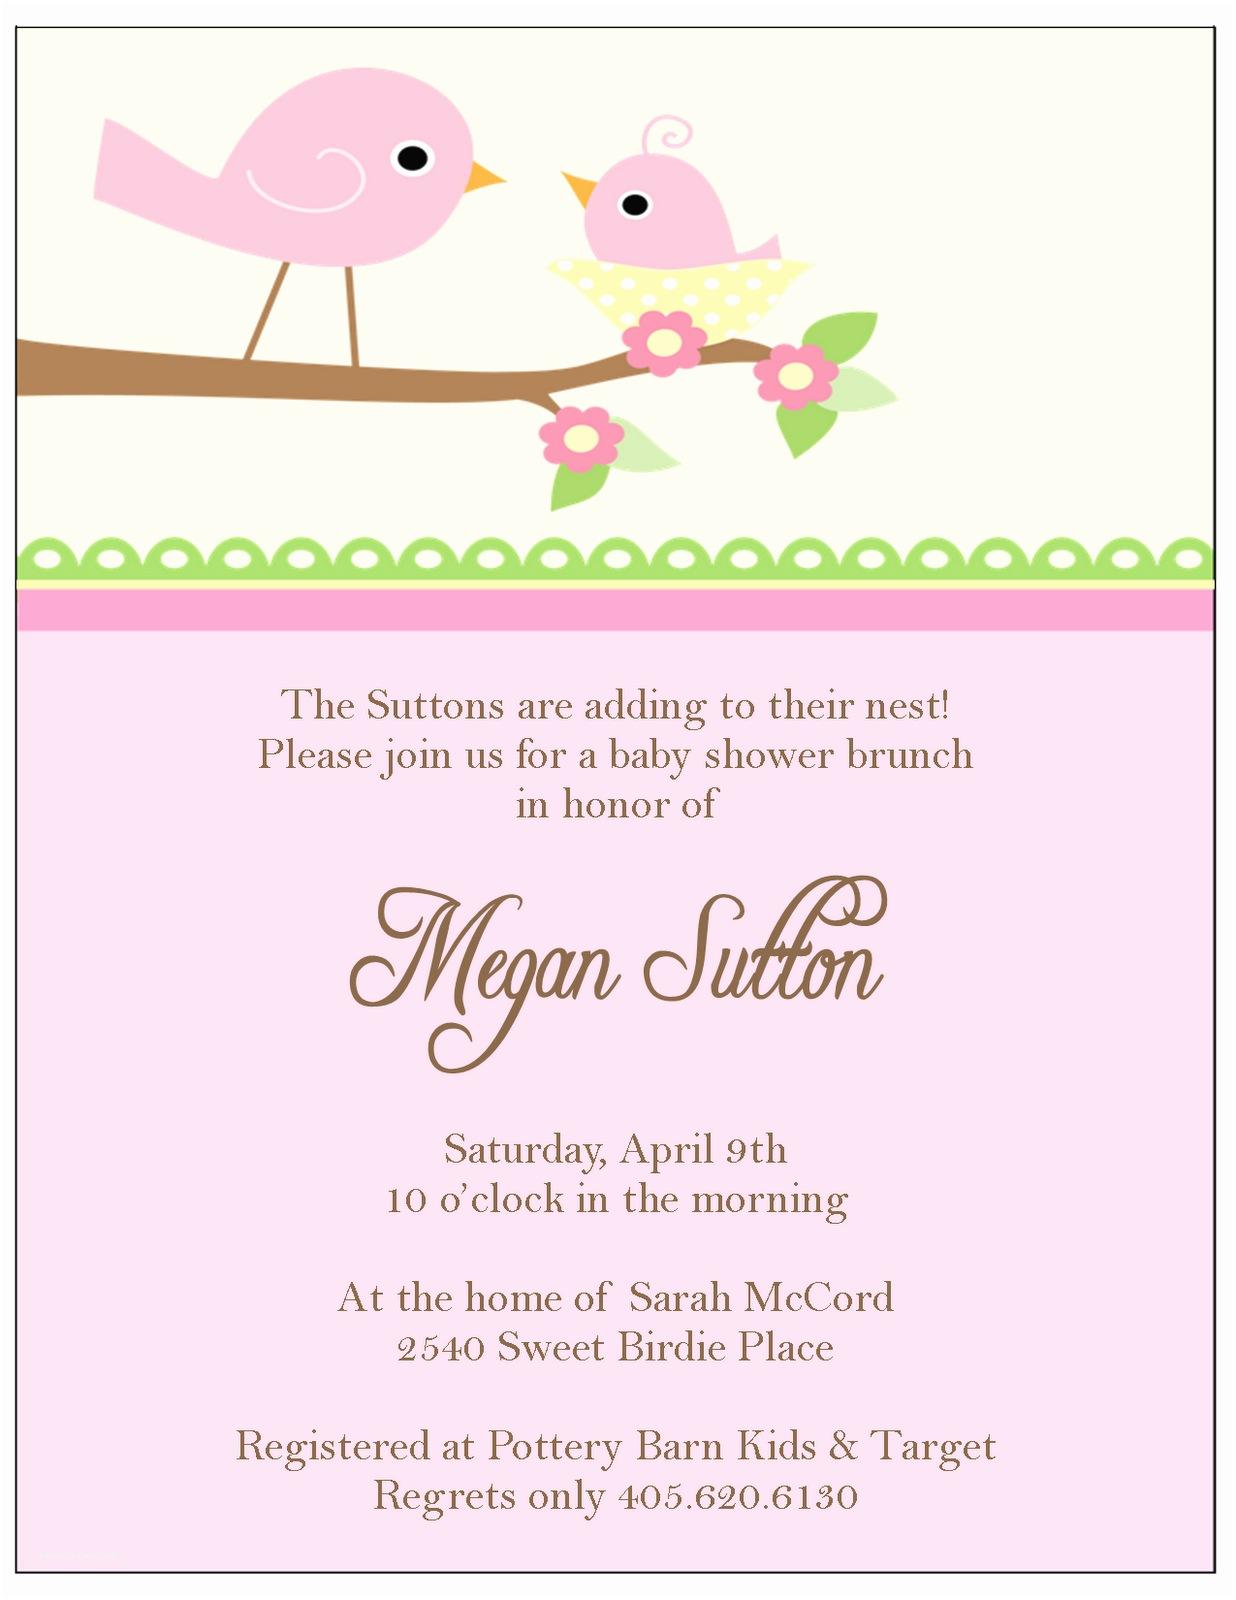 Best Baby Shower Invitations Baby Shower Invitations for Girls